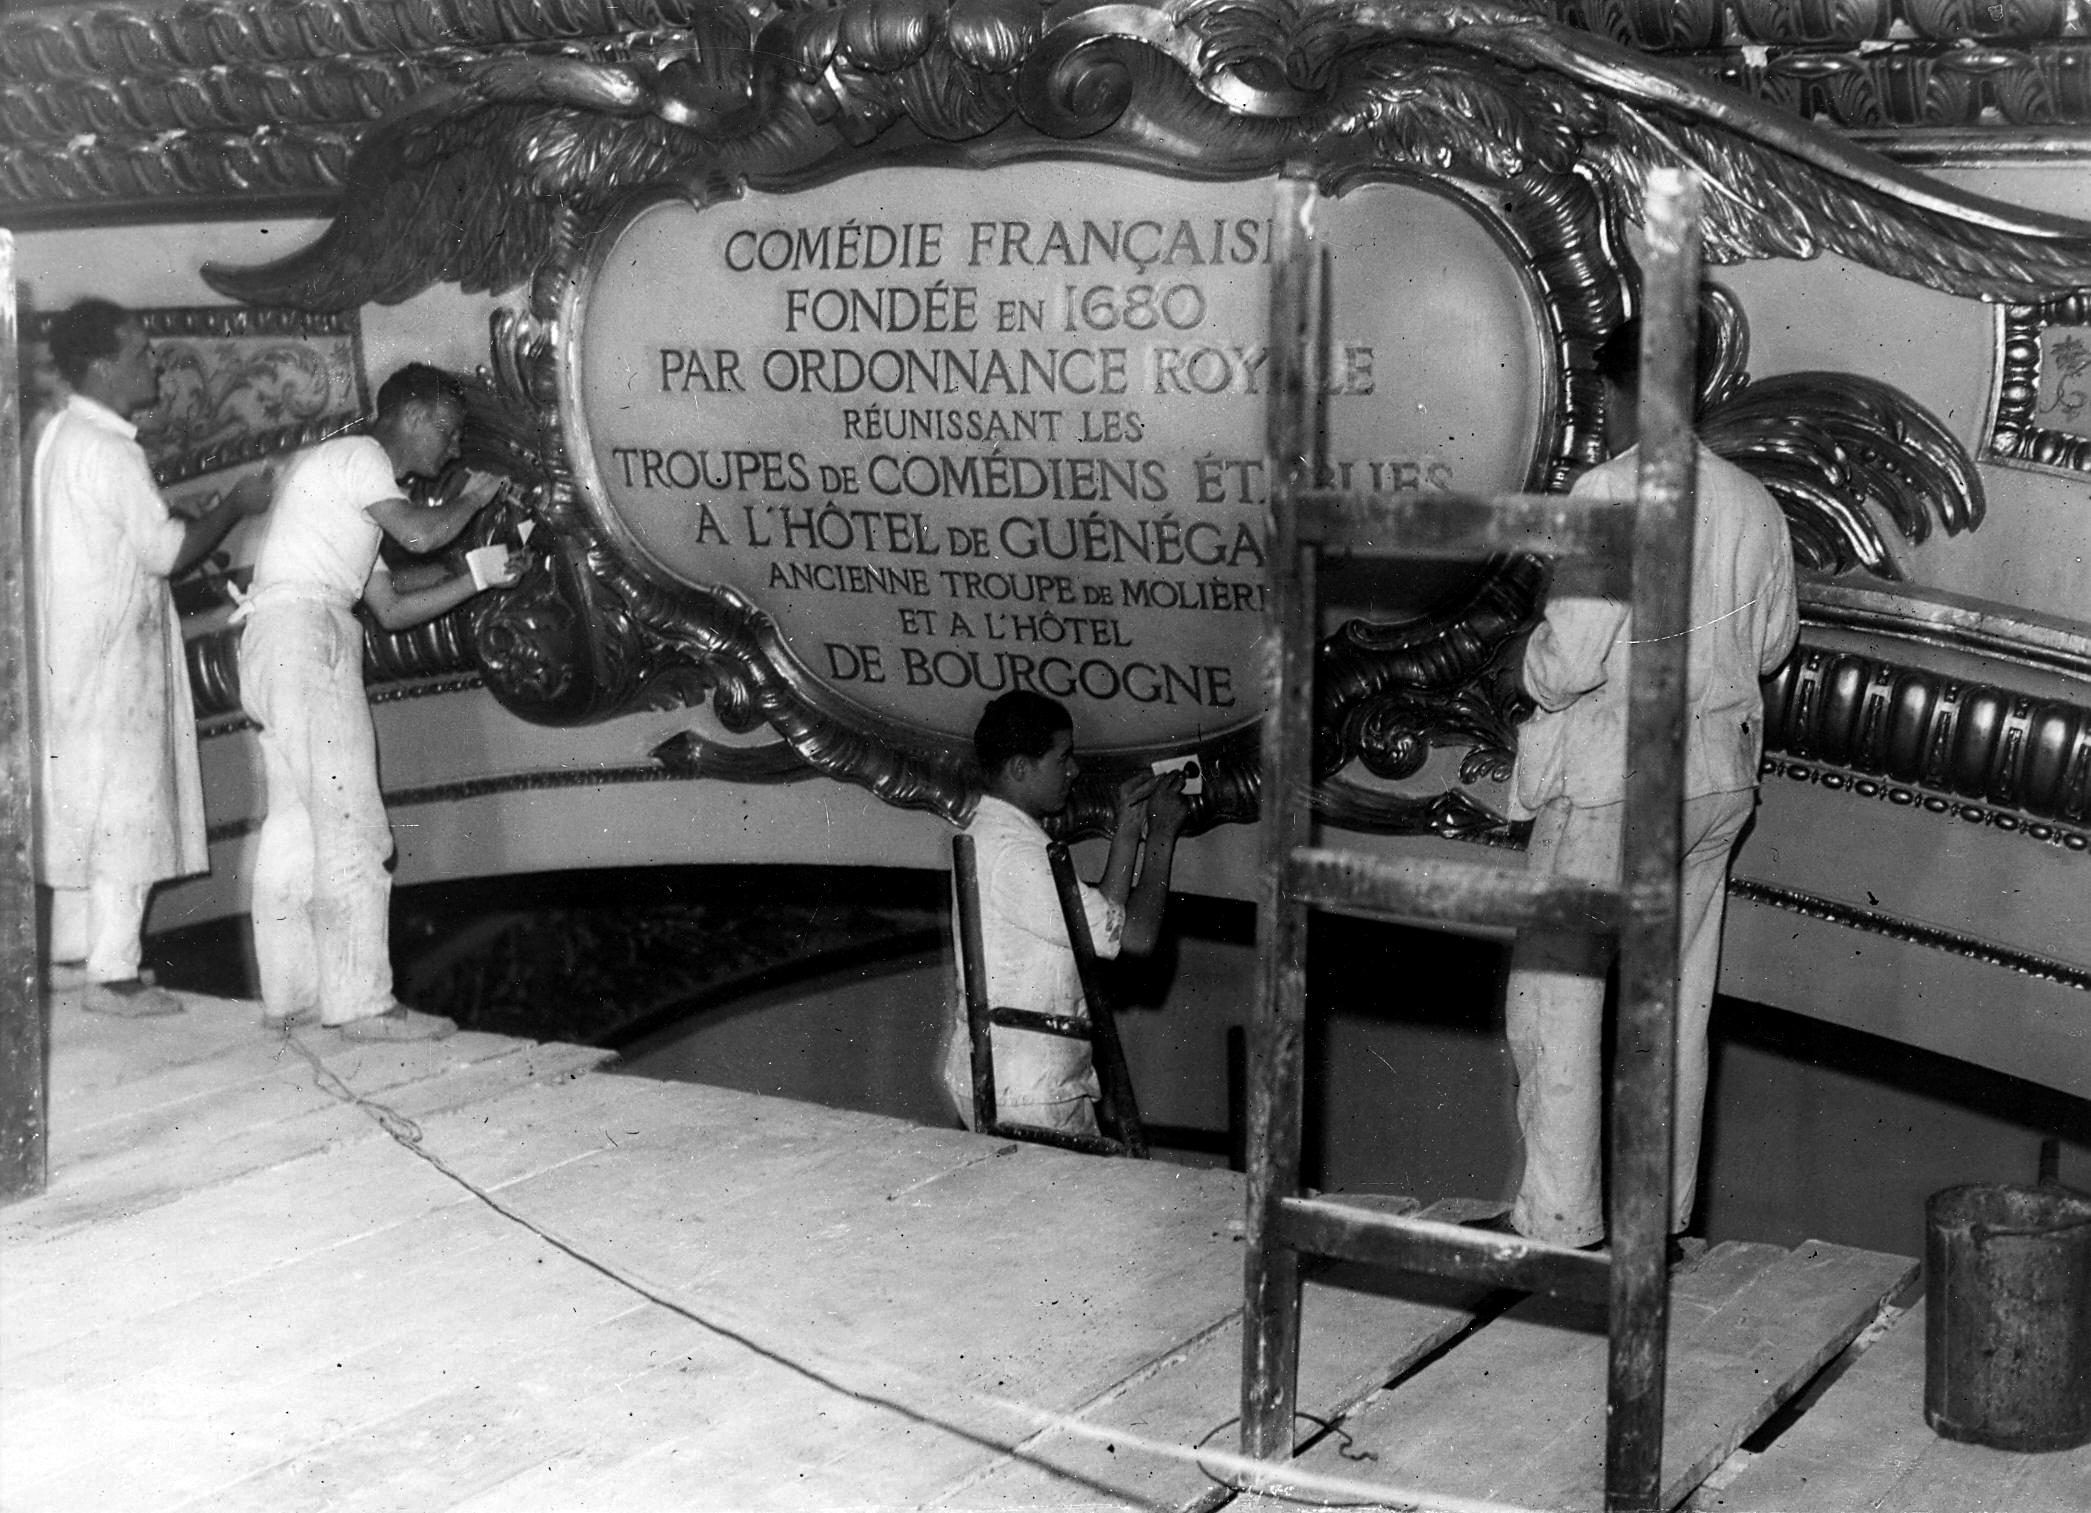 1935-salle-richelieu-pose-du-cartouche-1935-photo.-fulgur